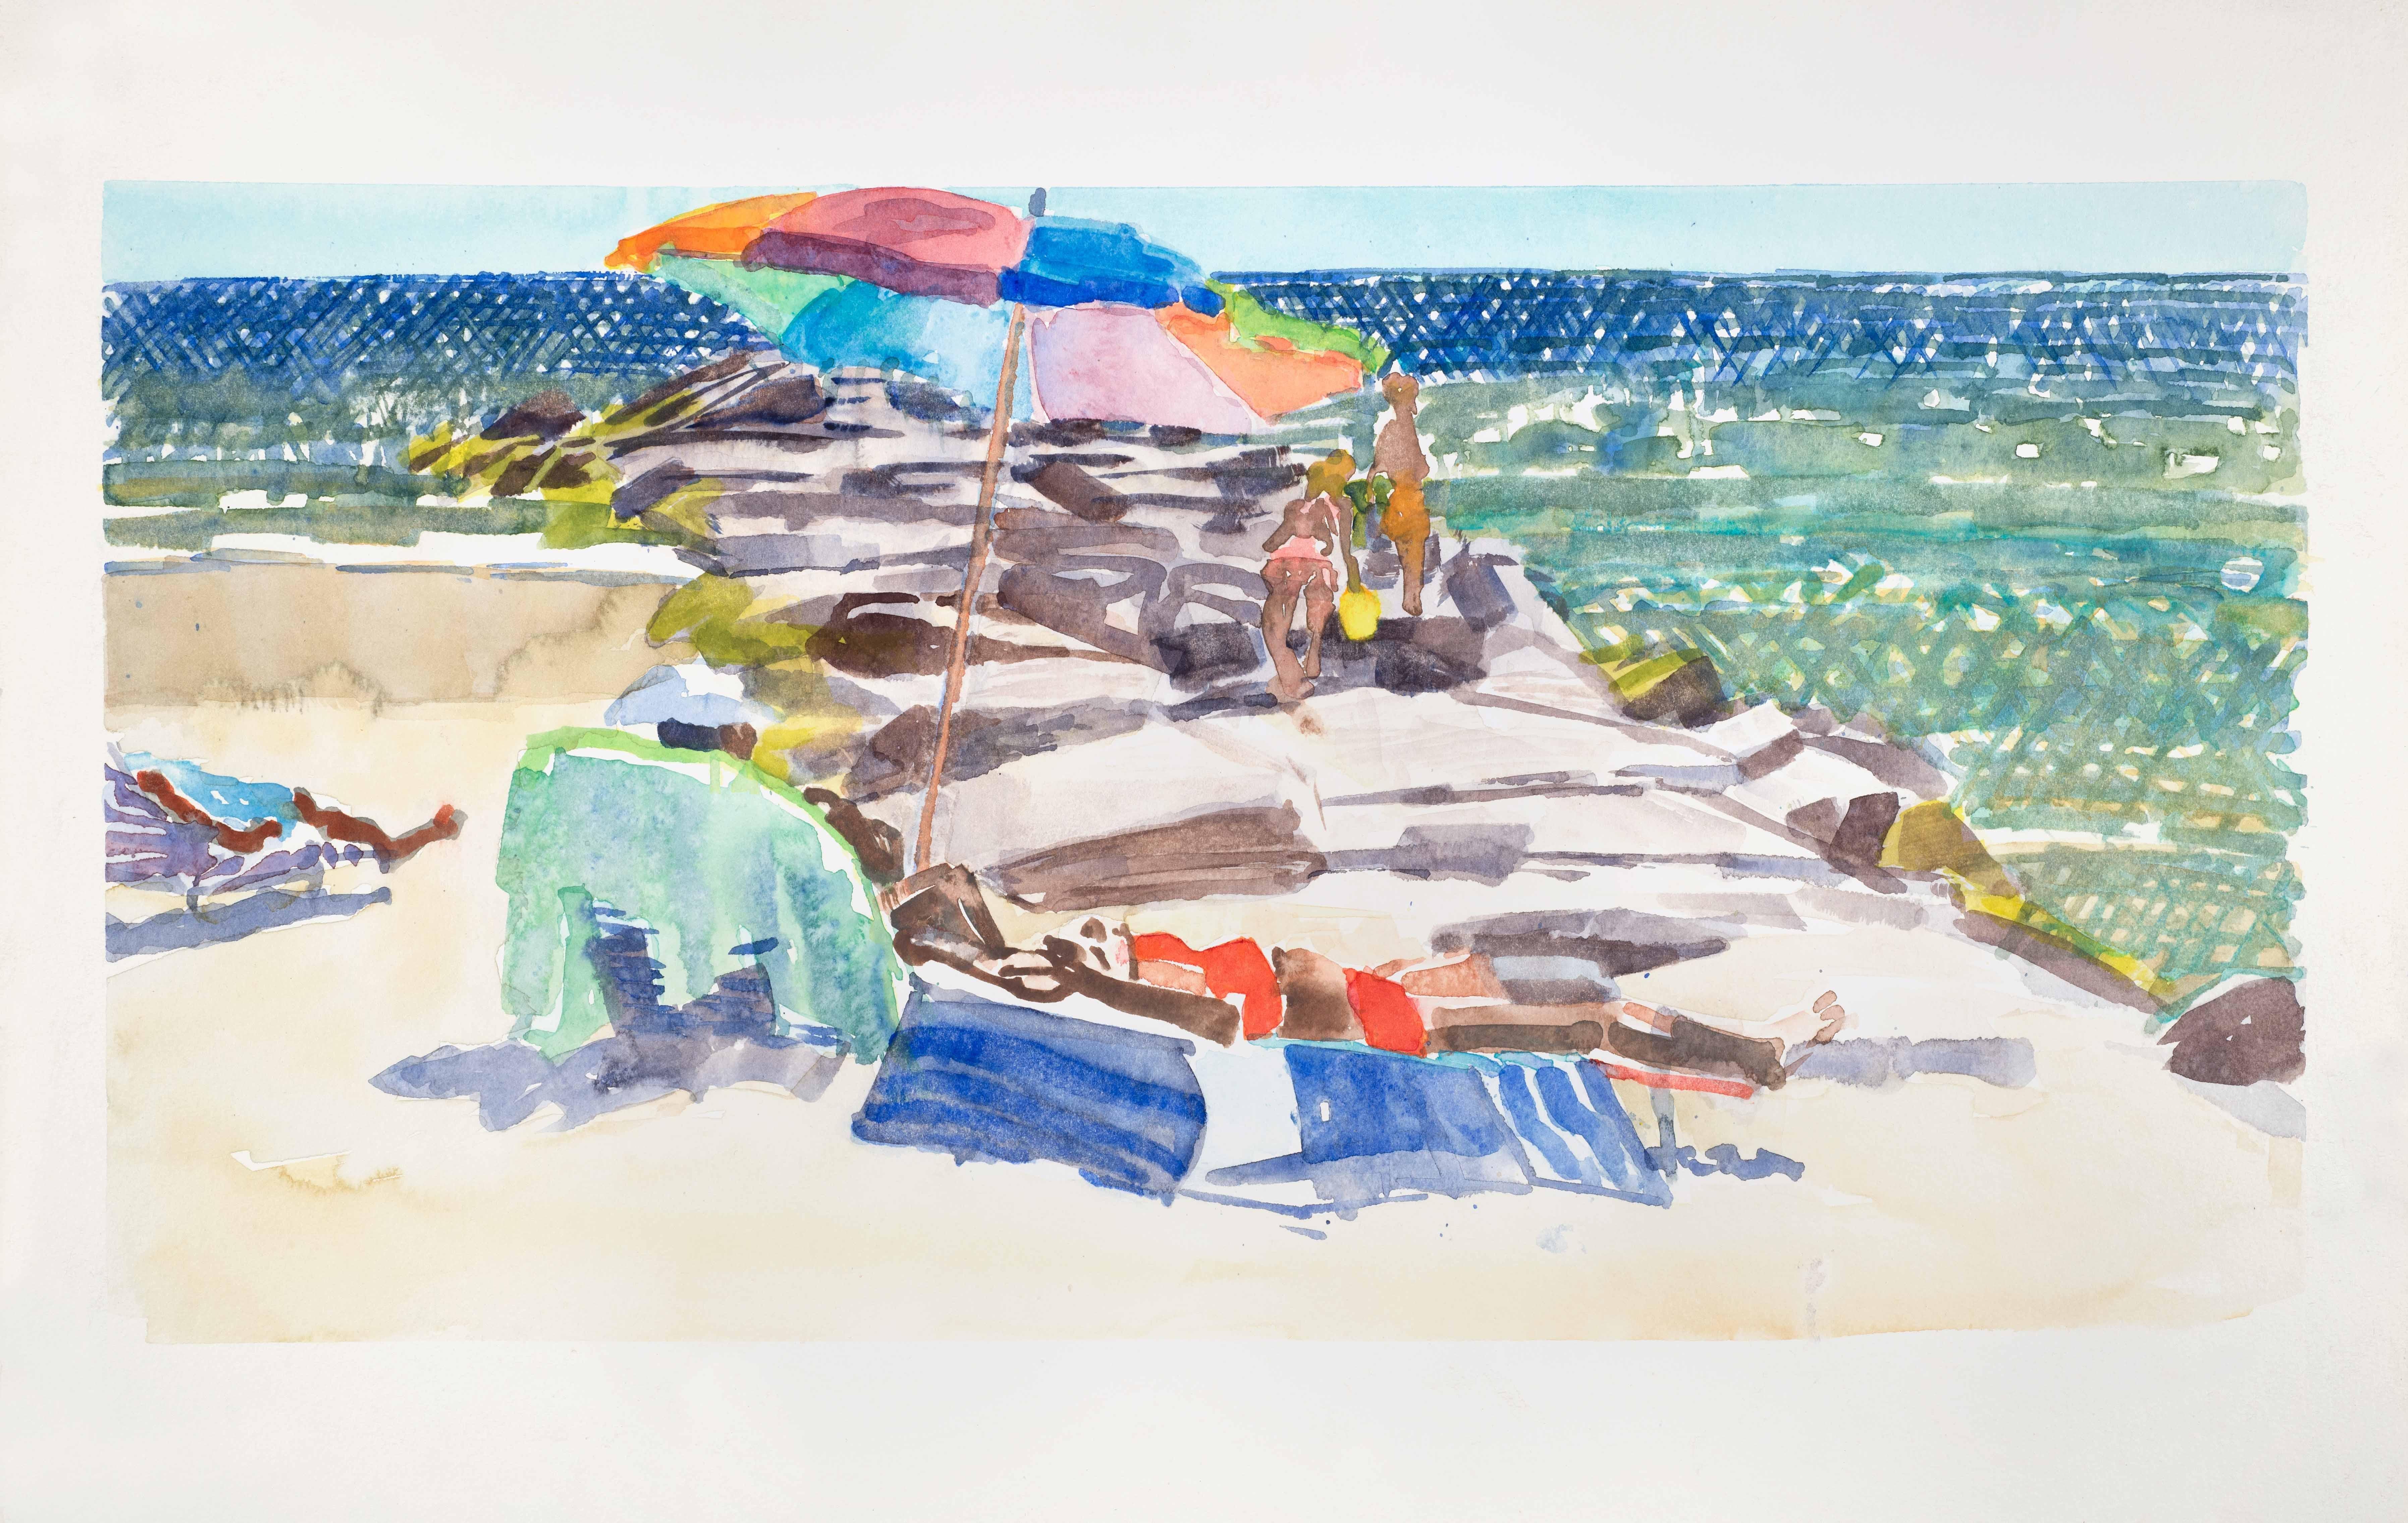 Long Beach Jetty 2, bright watercolor beach scene, work on paper